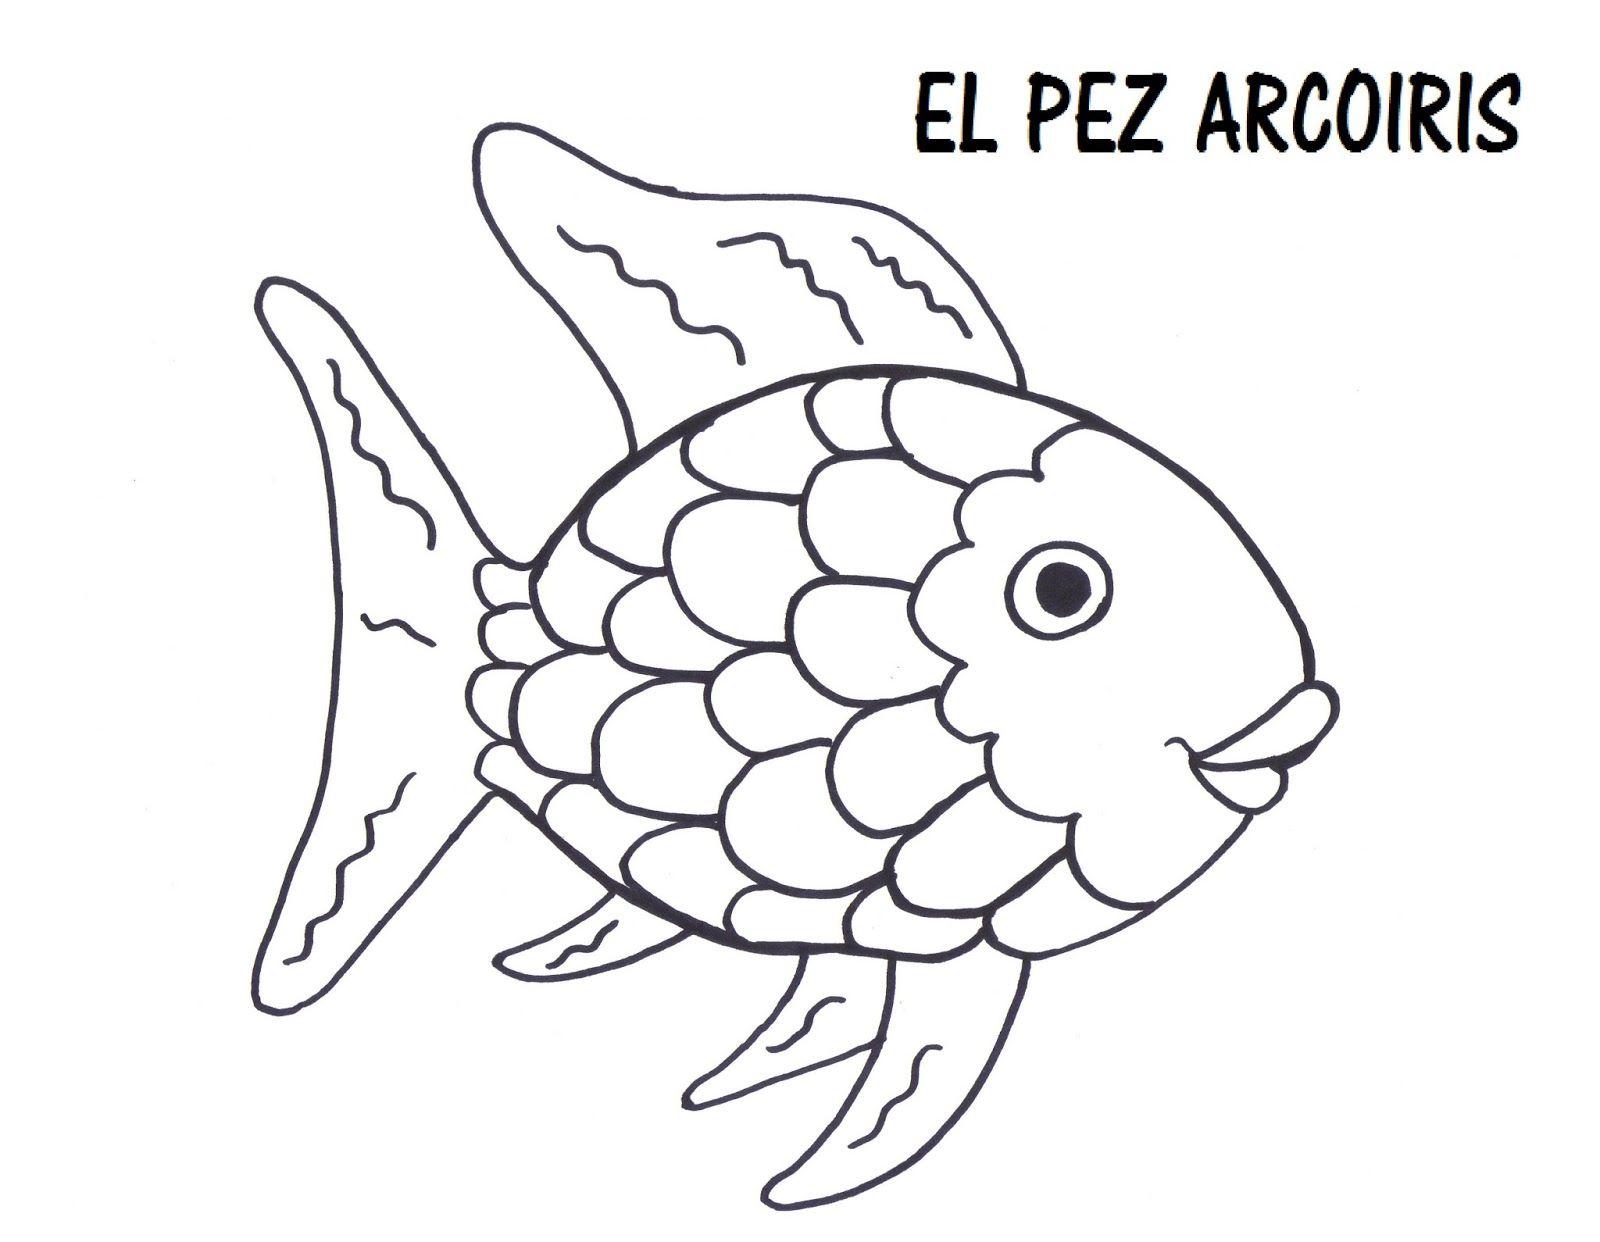 imagenes de dibujo de pez - Buscar con Google   ideas   Pinterest ...